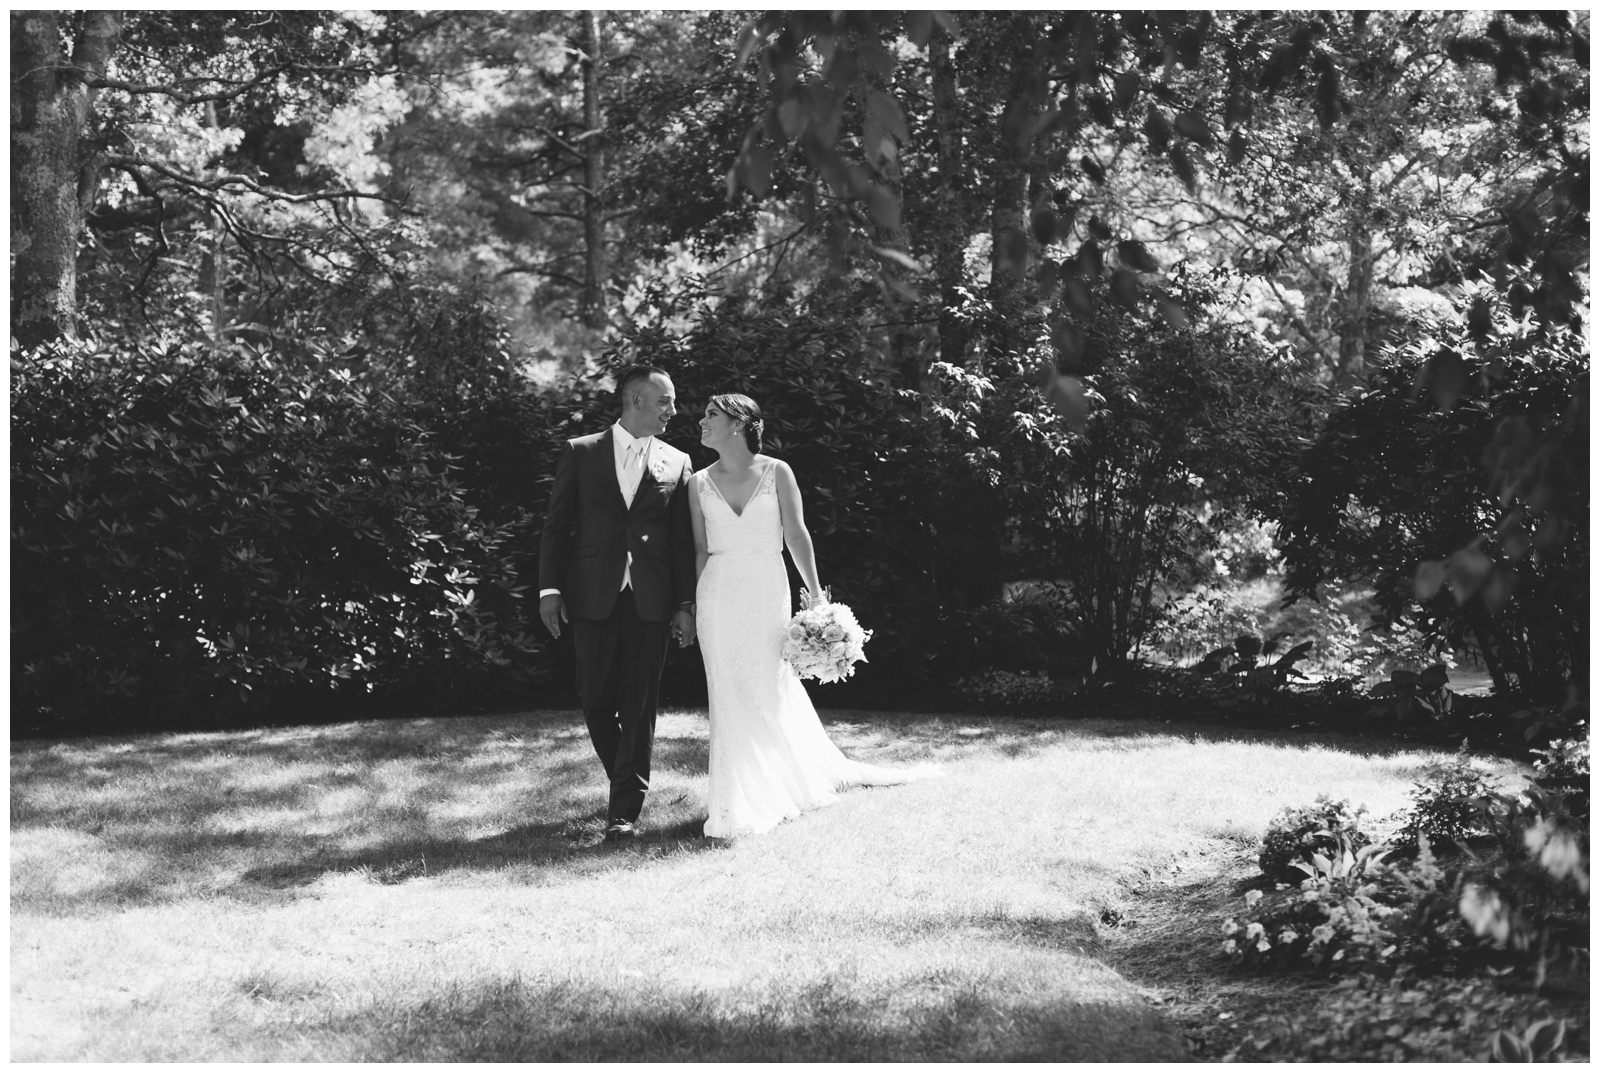 Bailey-Q-Photo-Pine-Hills-Pavilion-Wedding-Boston-Wedding-Photographer-024.jpg